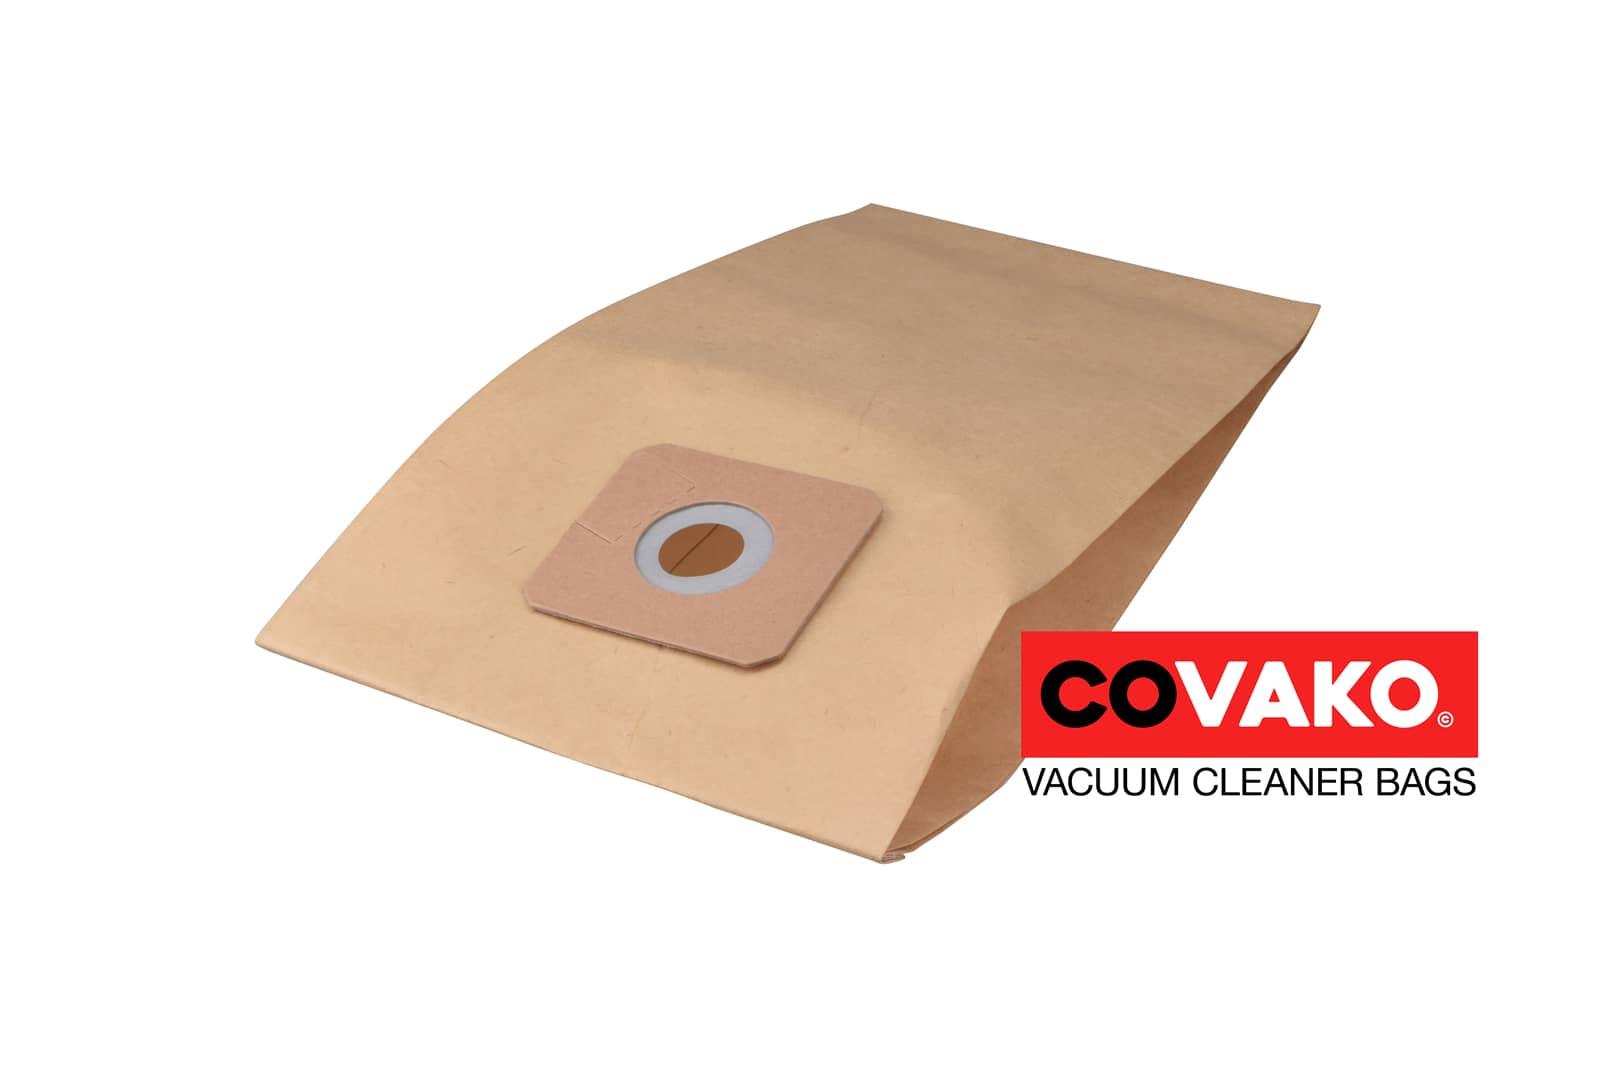 Kärcher T 15/1 / Paper - Kärcher vacuum cleaner bags